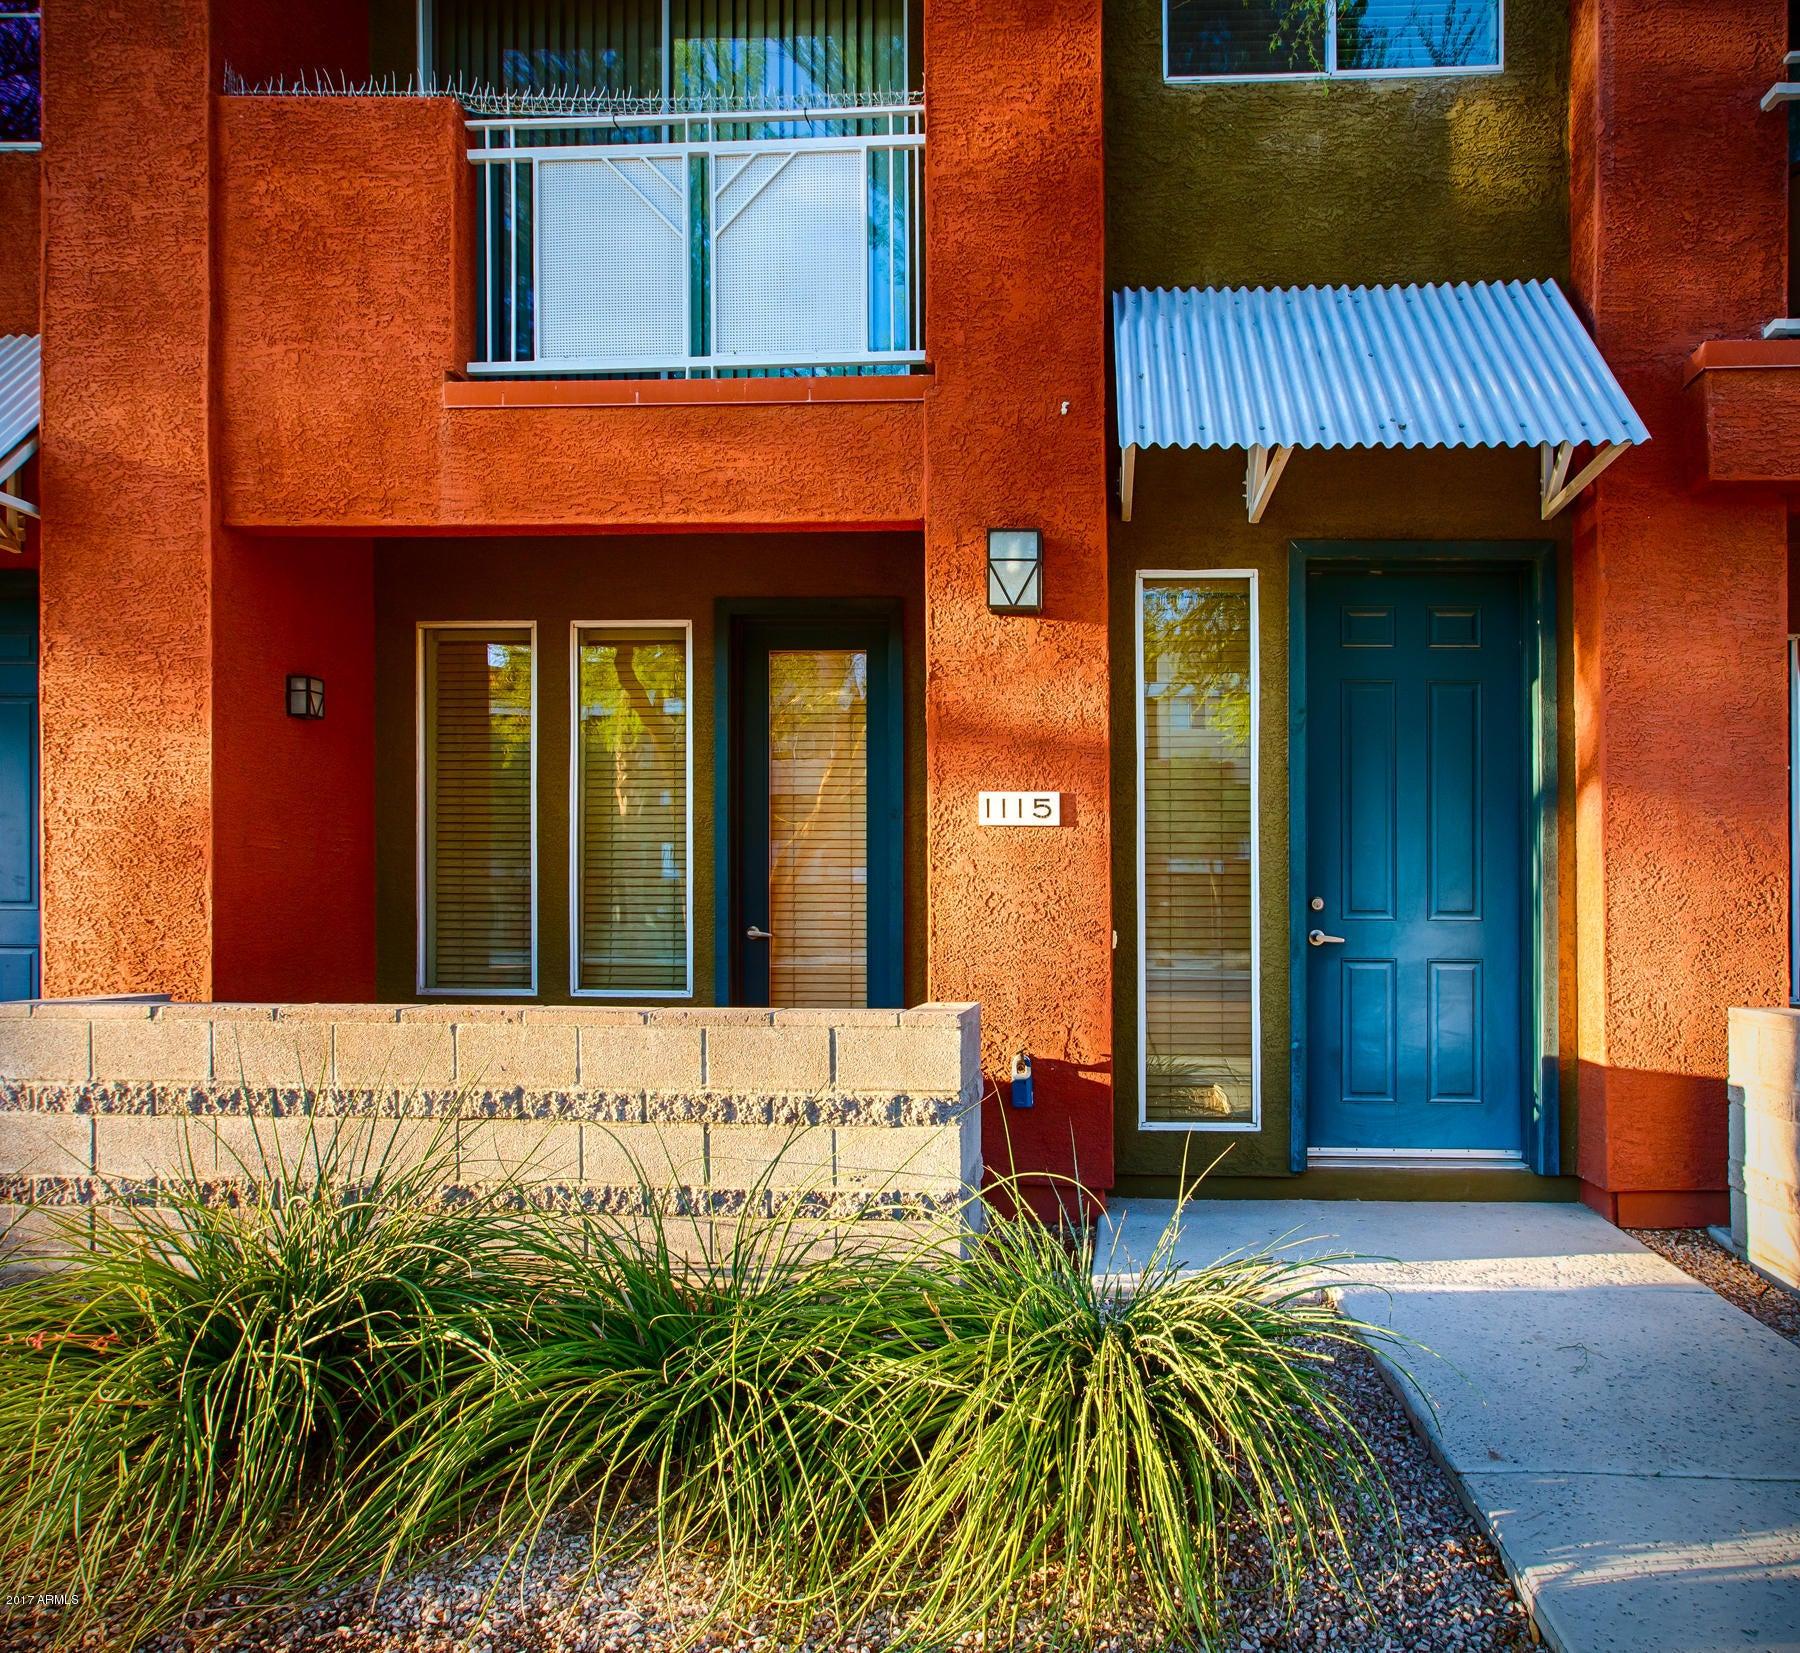 MLS 5624359 6745 N 93RD Avenue Unit 1115, Glendale, AZ 85305 Glendale AZ Condo or Townhome